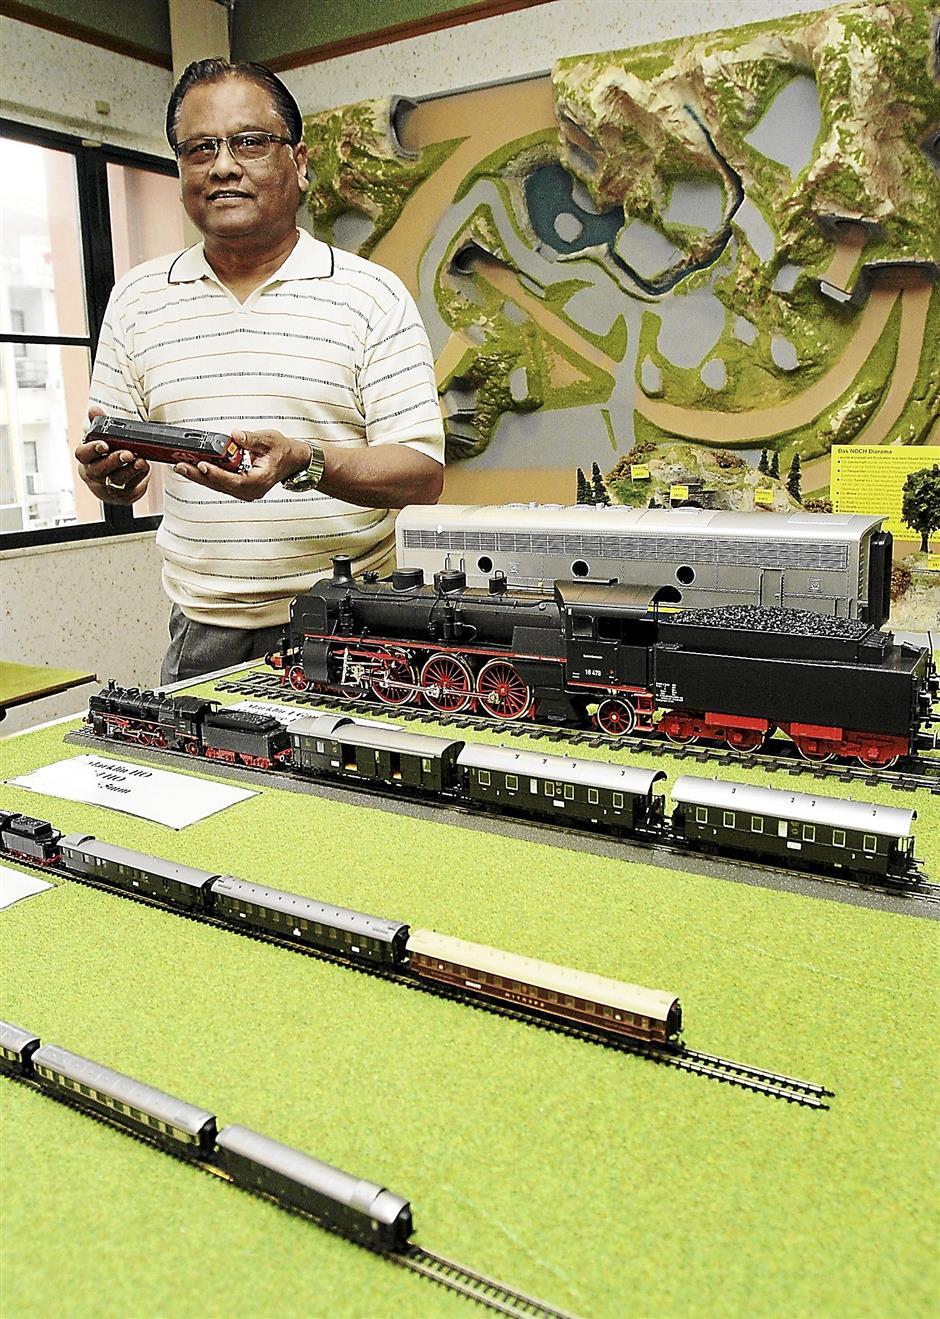 Wiring Model Railroad Hobbyist Magazine Having Fun With Model